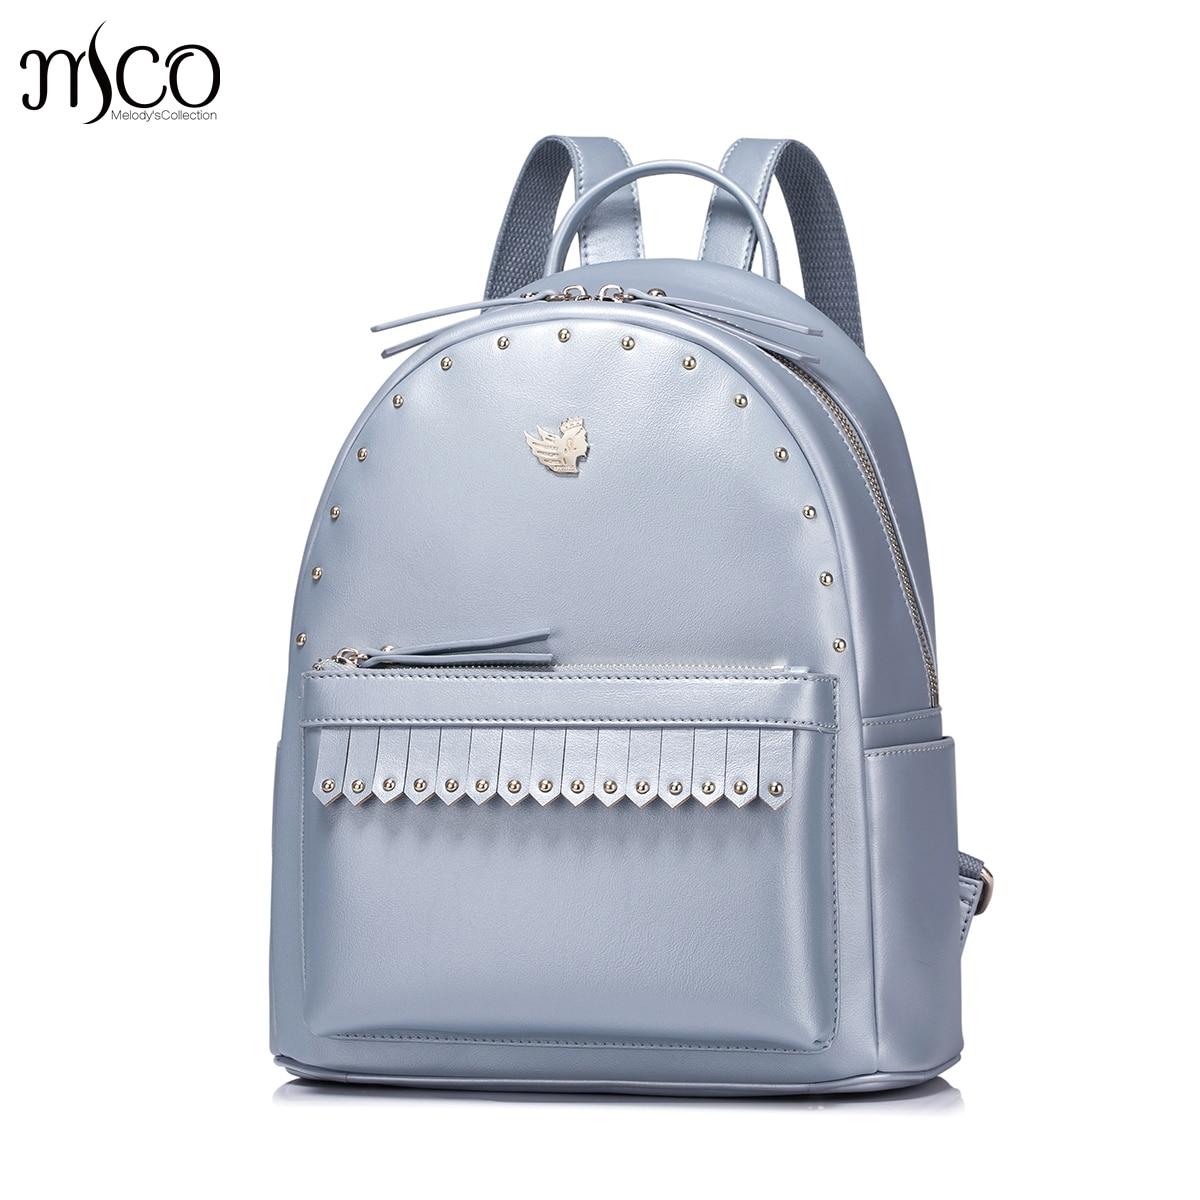 Women PU Leather Backpack Fashion Tassel Female Daily Shoulder Bags Ladies Daypack gilrs Schoolbag Rivet Elegant Travel Rucksack